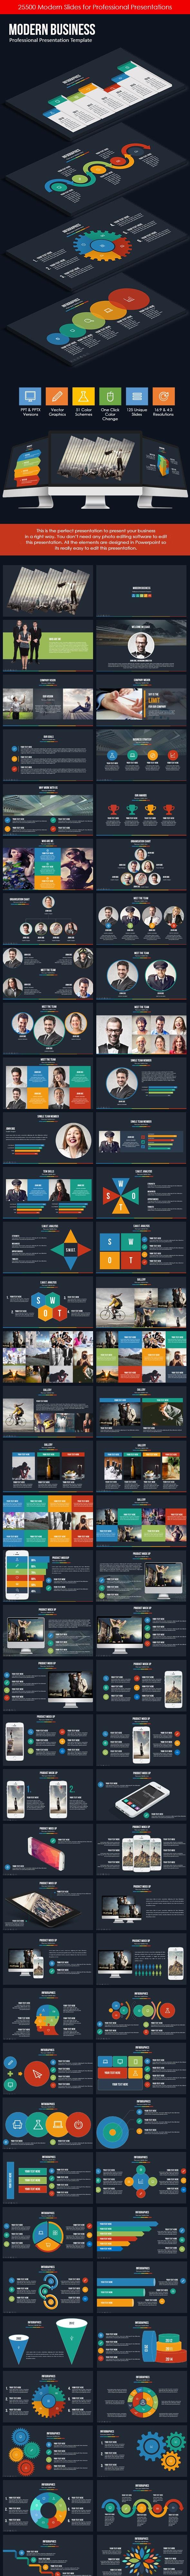 Modern Business PowerPoint Template - Business PowerPoint Templates